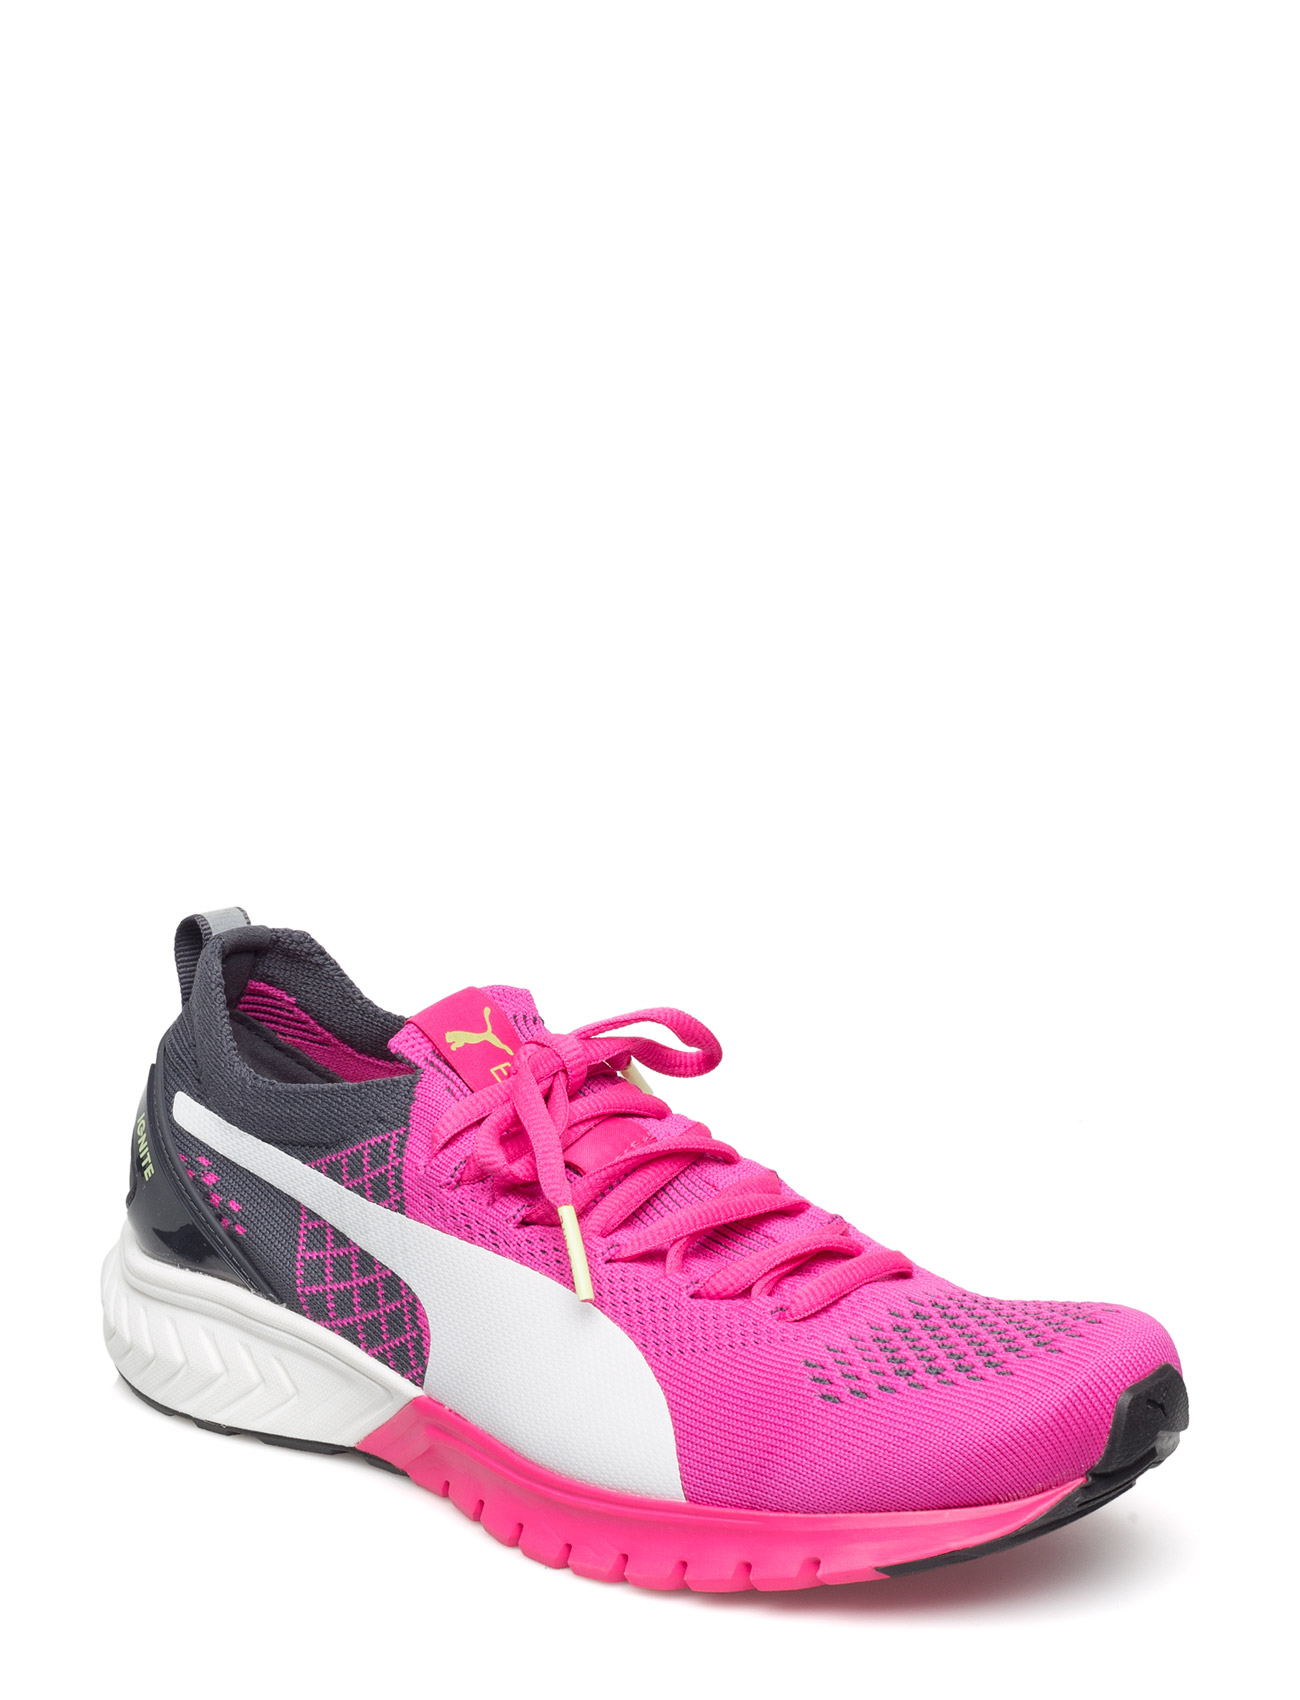 Ignite Dual Proknit Wn'S PUMA SPORT Sports sko til Kvinder i